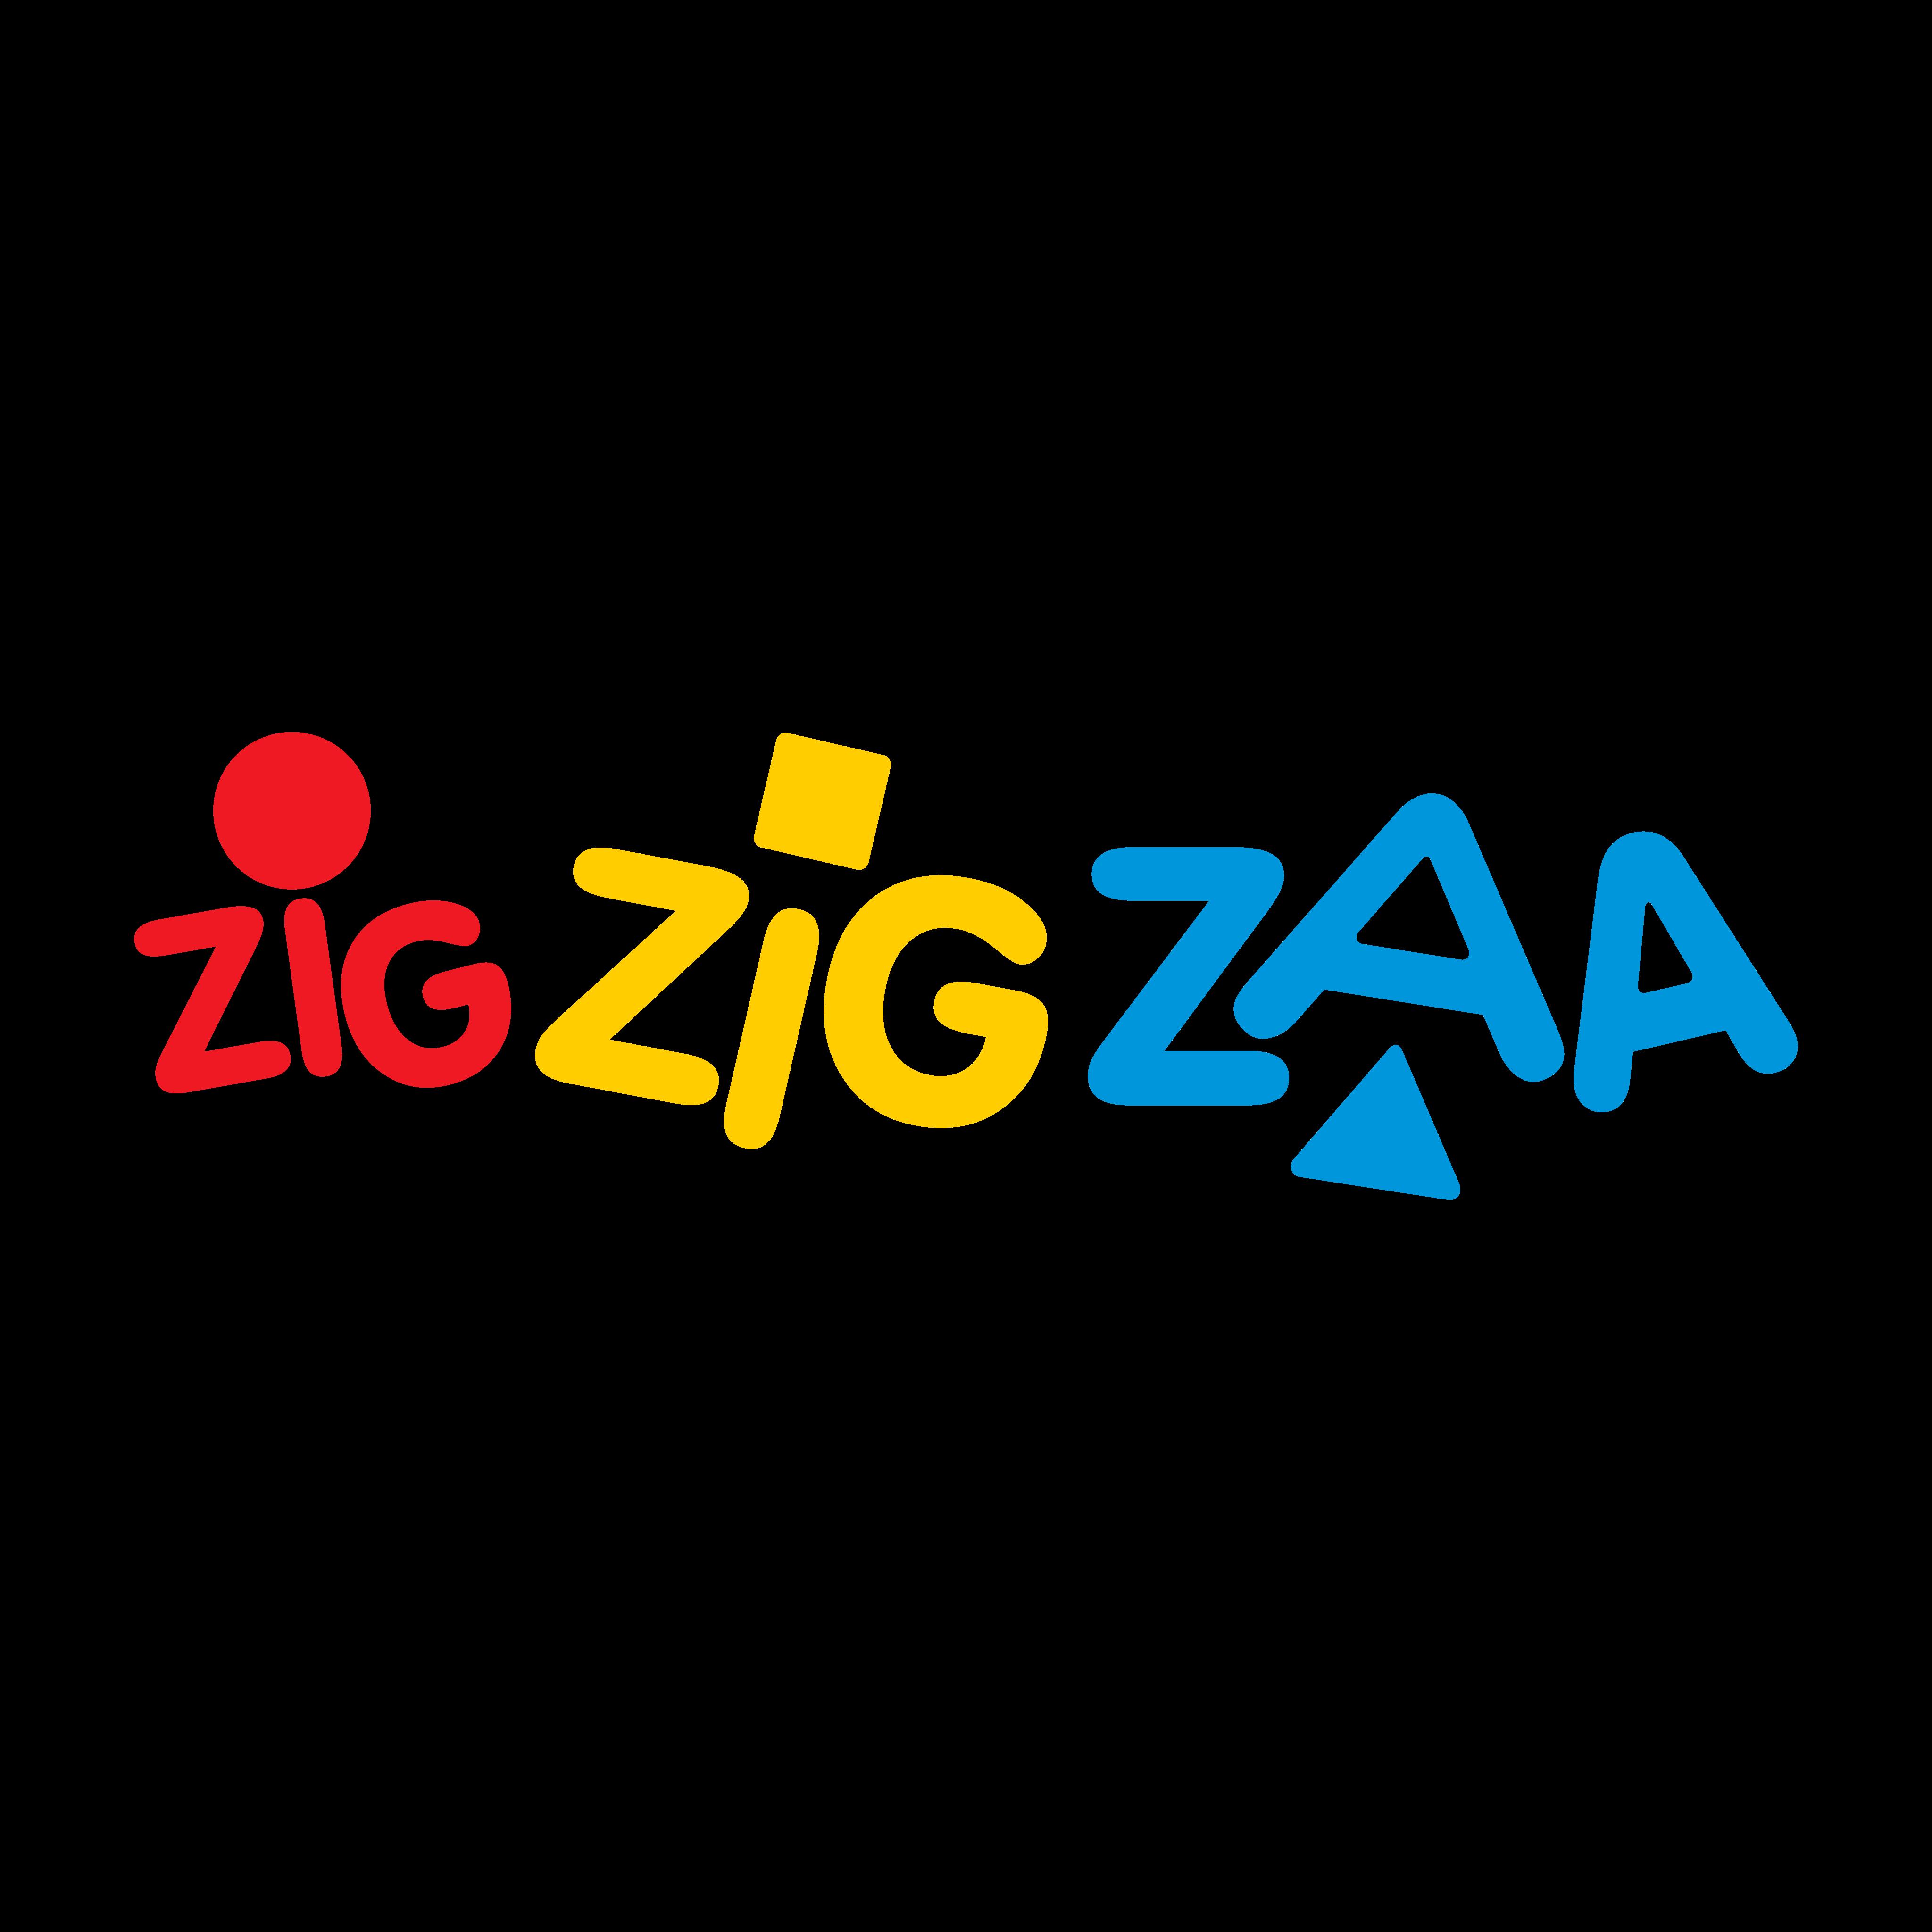 zig zig zaa logo 0 - Zig Zig Zaa Logo